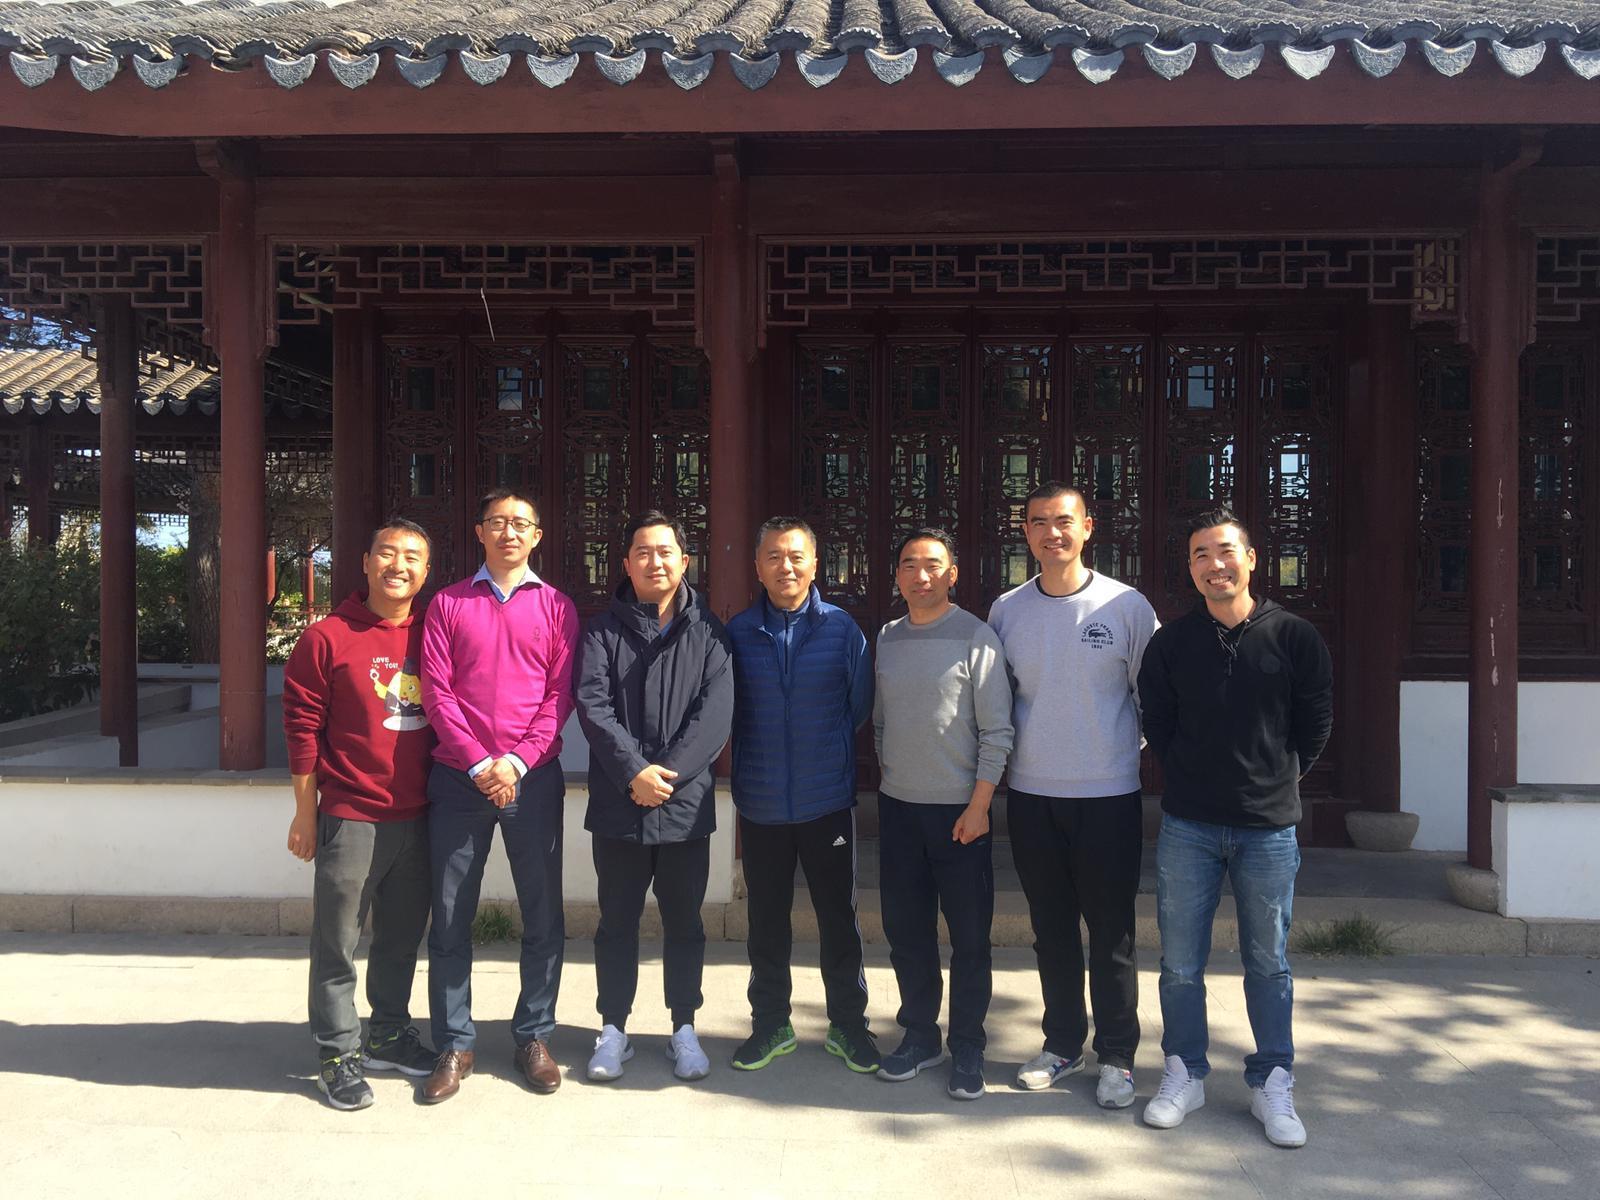 From left to right: Zhang Ming, Zhang Da, Chen Juheng (Vice President), Li Min(Vice President), Li Jianmin(General Secretary), Fang Guanguan, Ma Jian.. of the Chinese Community Association. The community includes around 400 people.